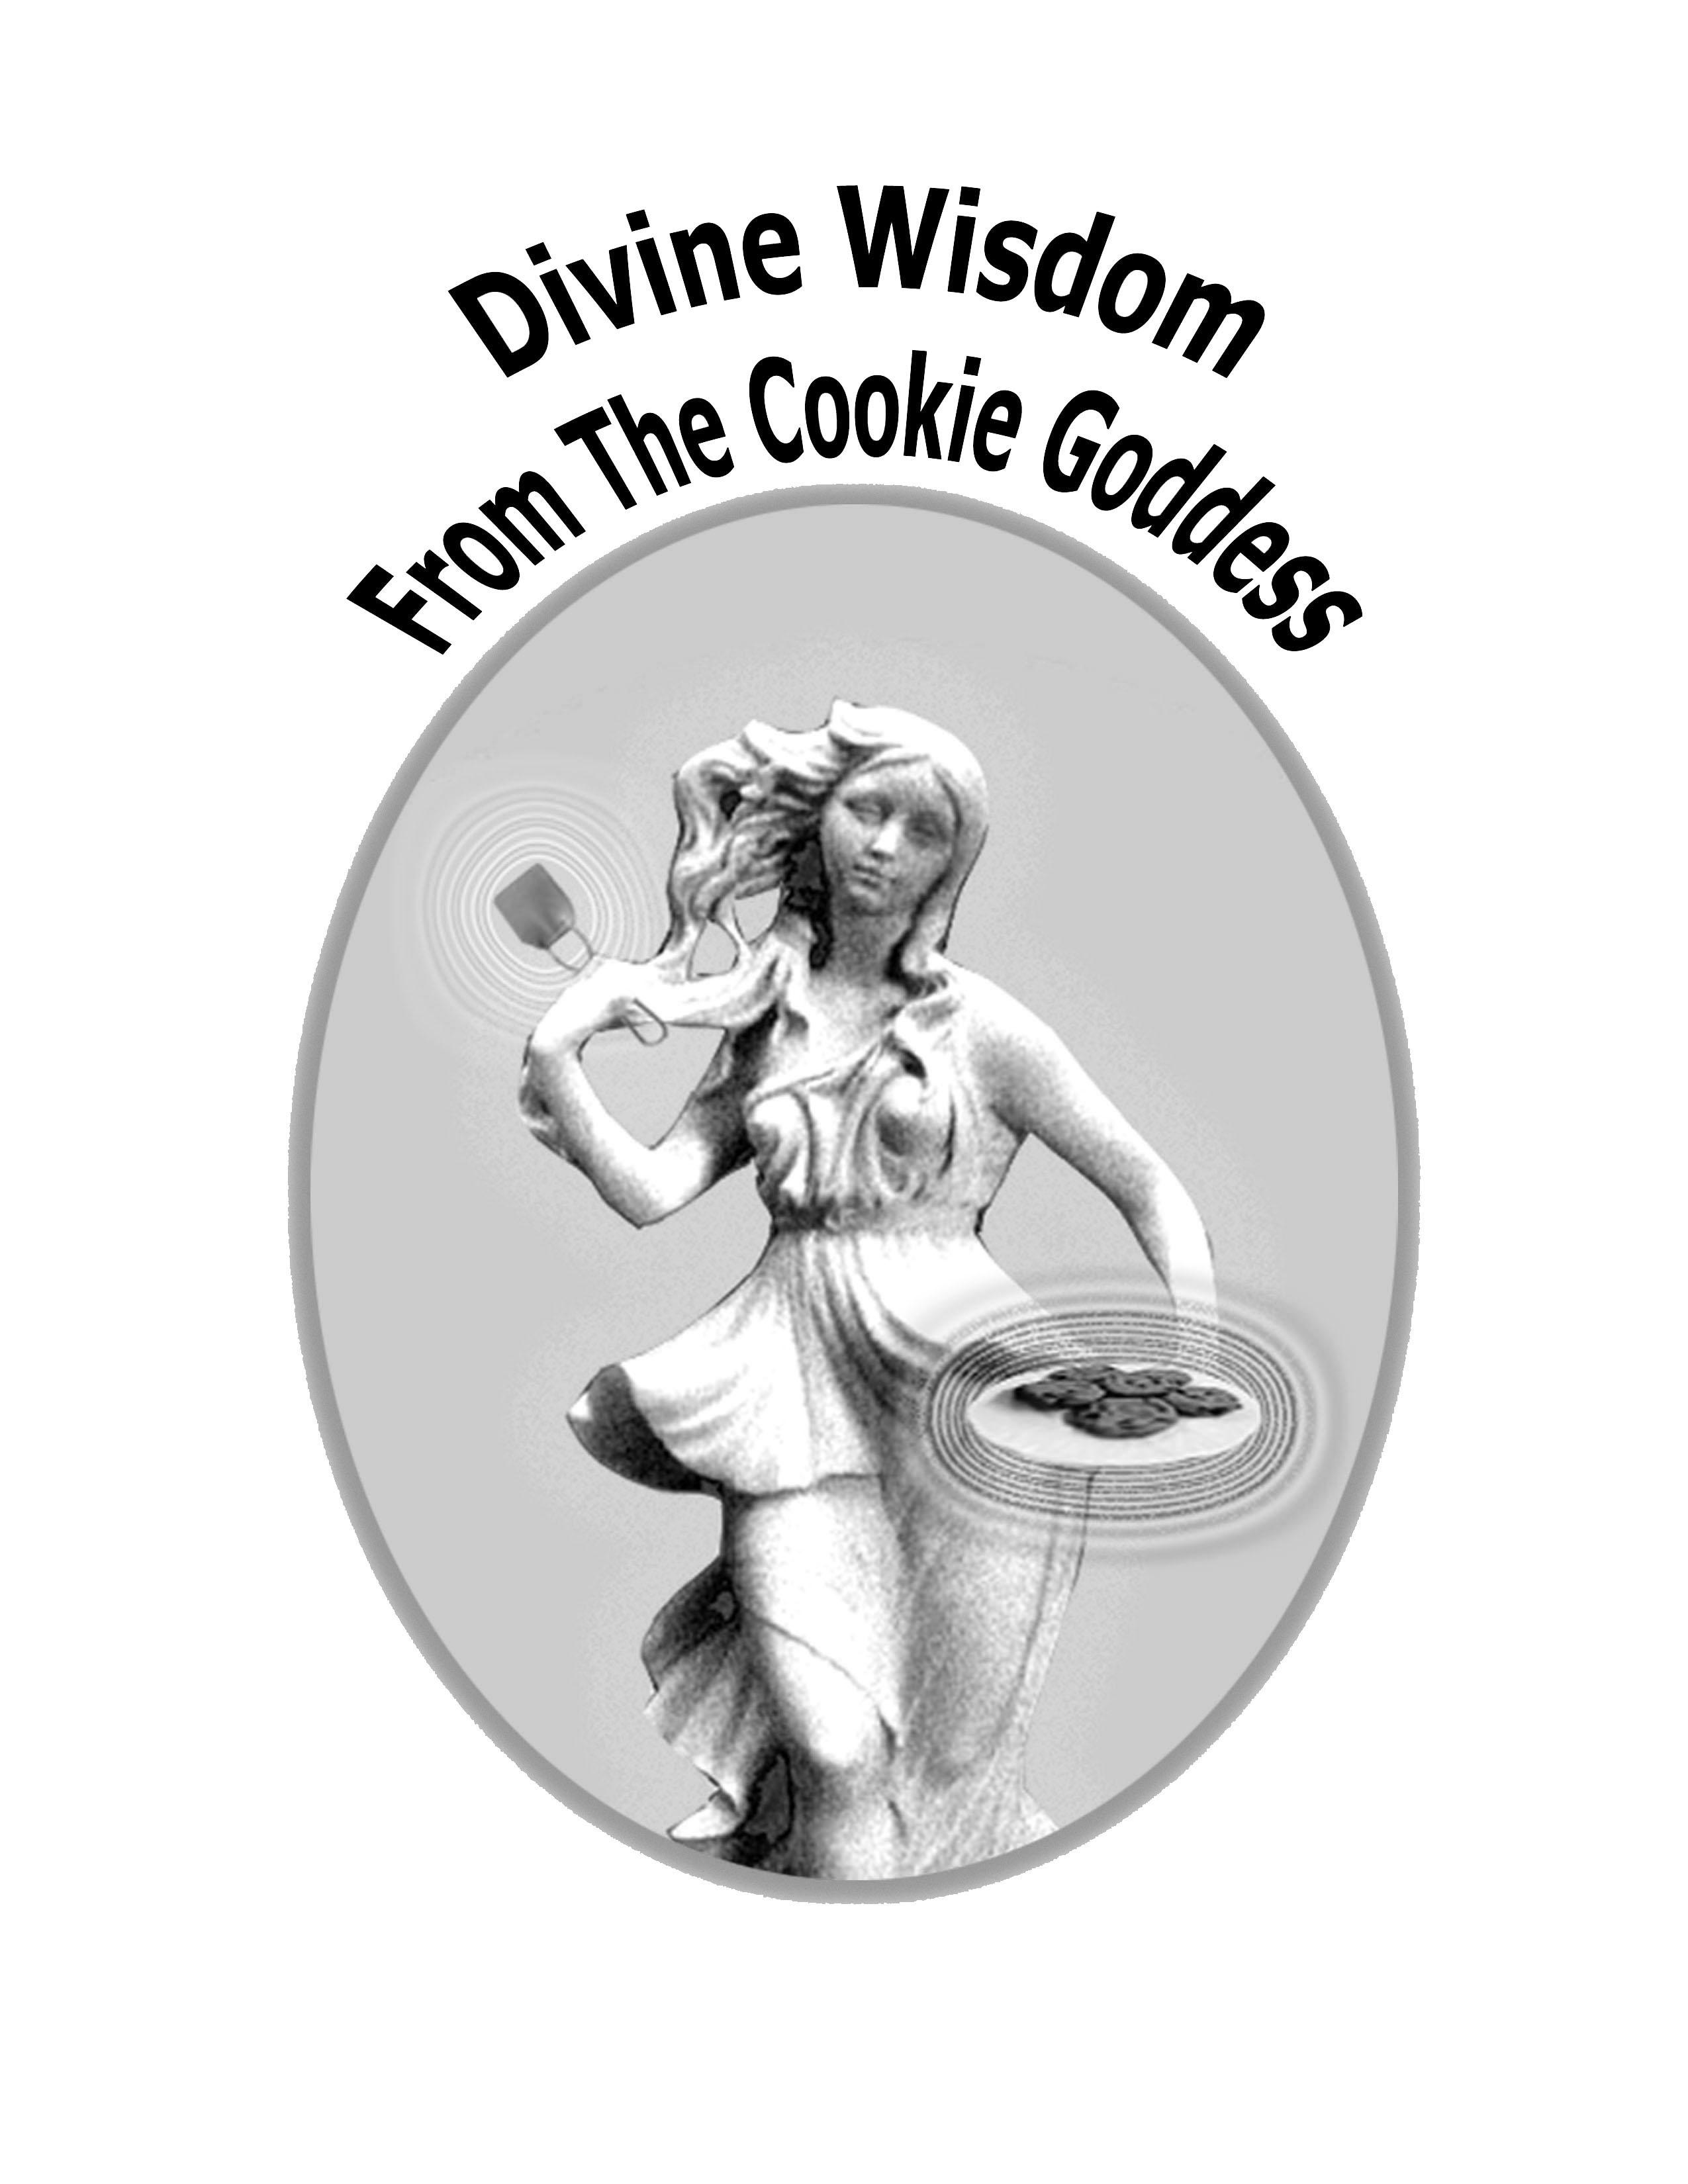 Cookie Goddess